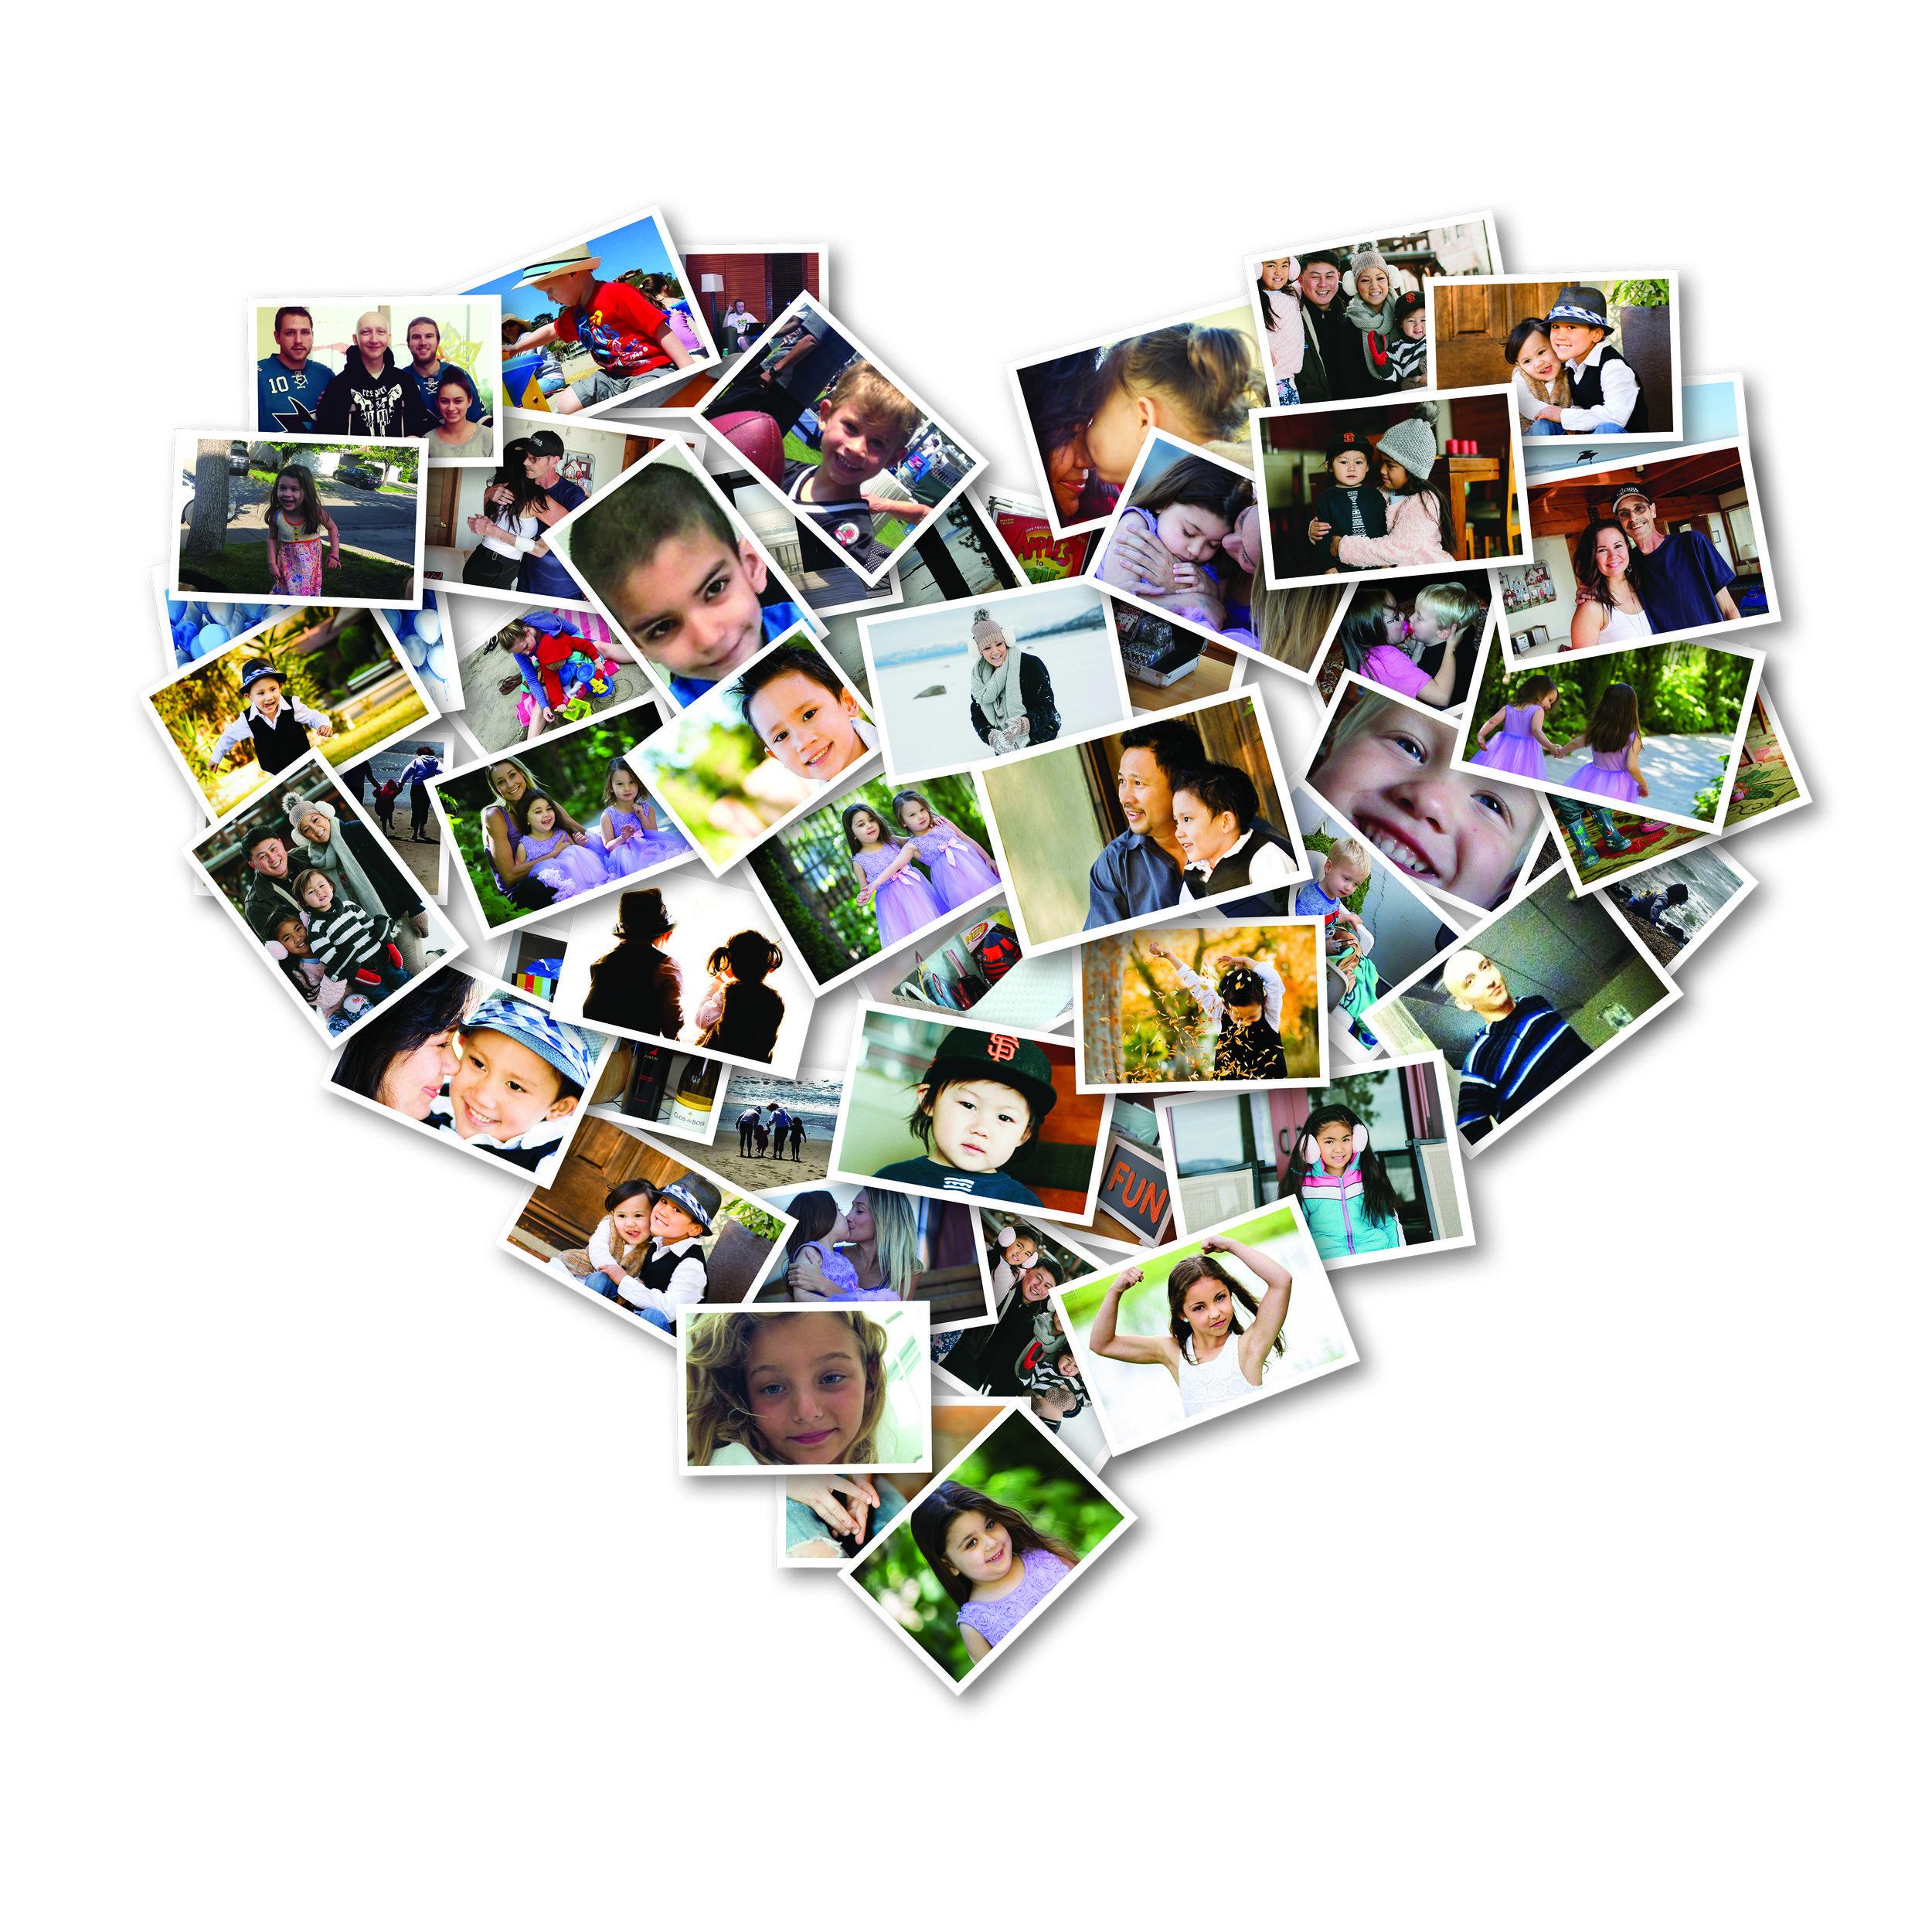 New Heart2_Steve-p1b8b52kd2an41qor2a5ahq1kod.jpg